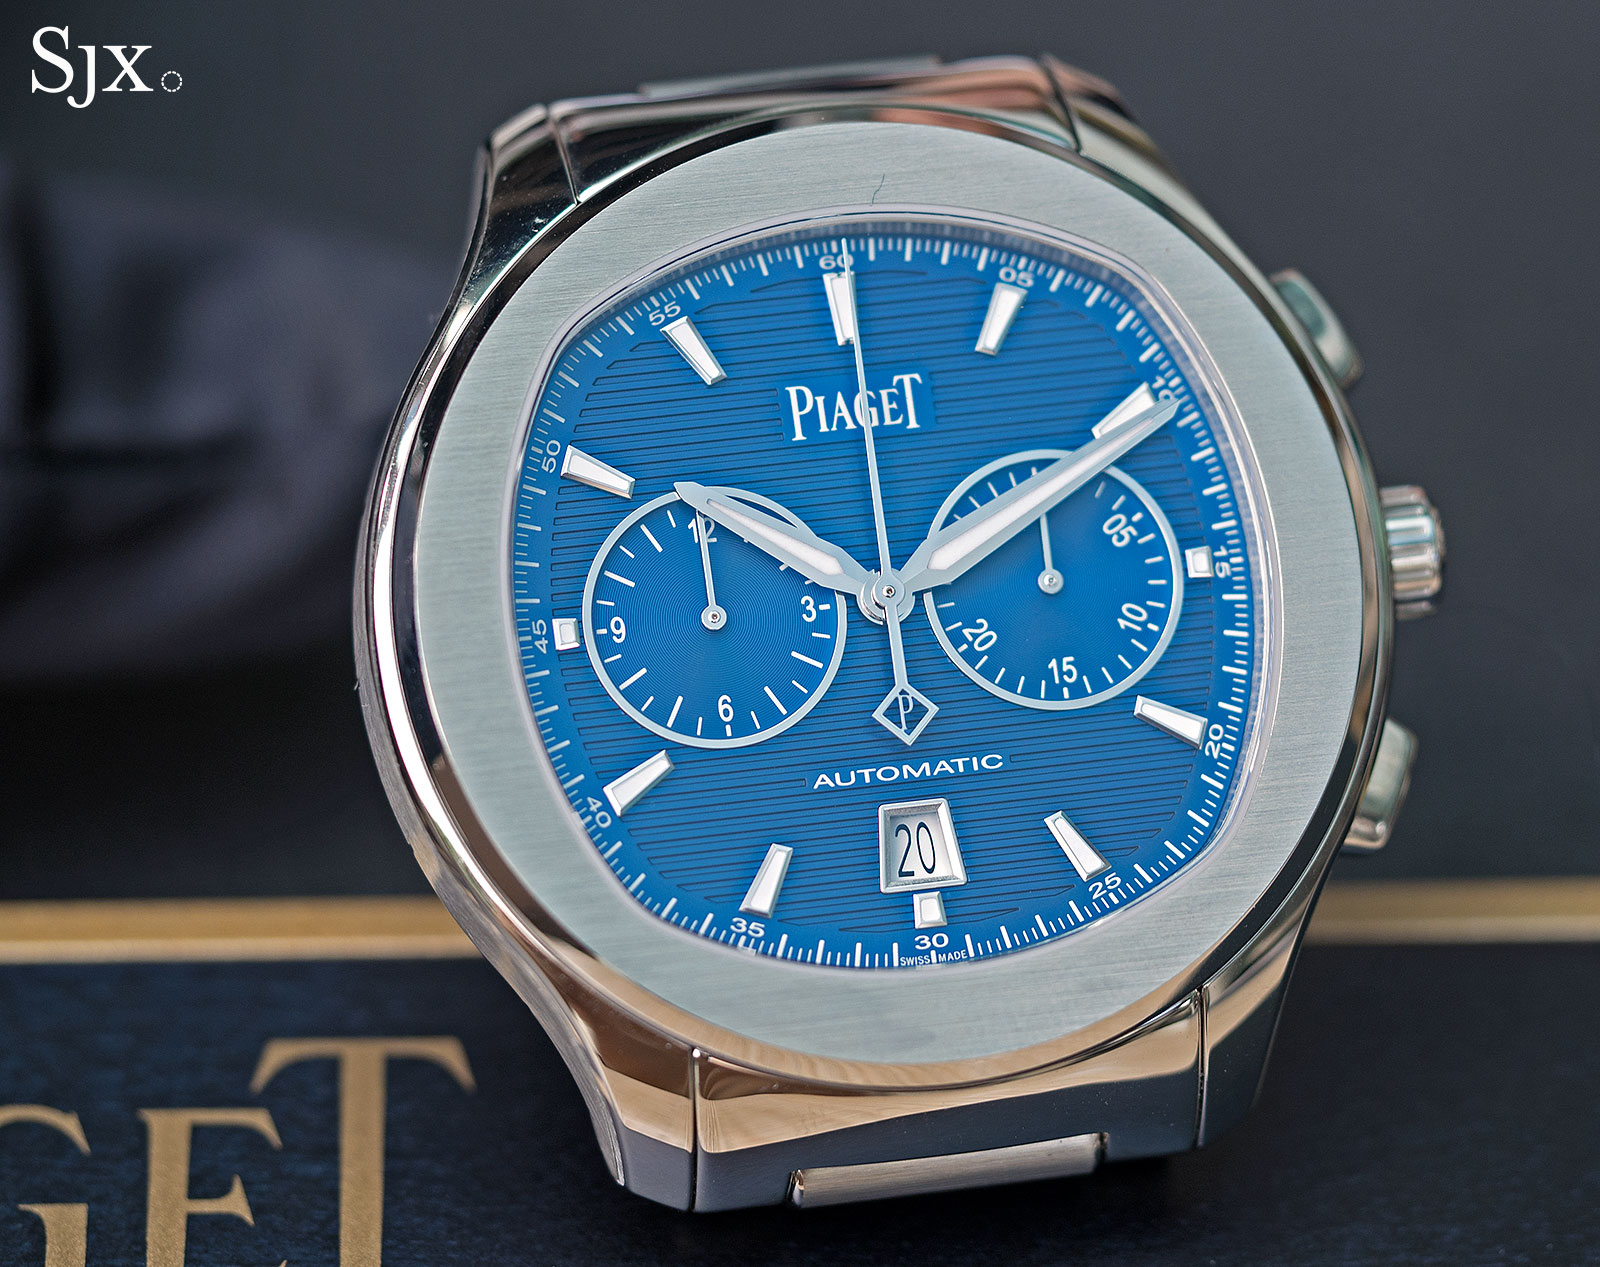 Piaget Polo S Chronograph 1